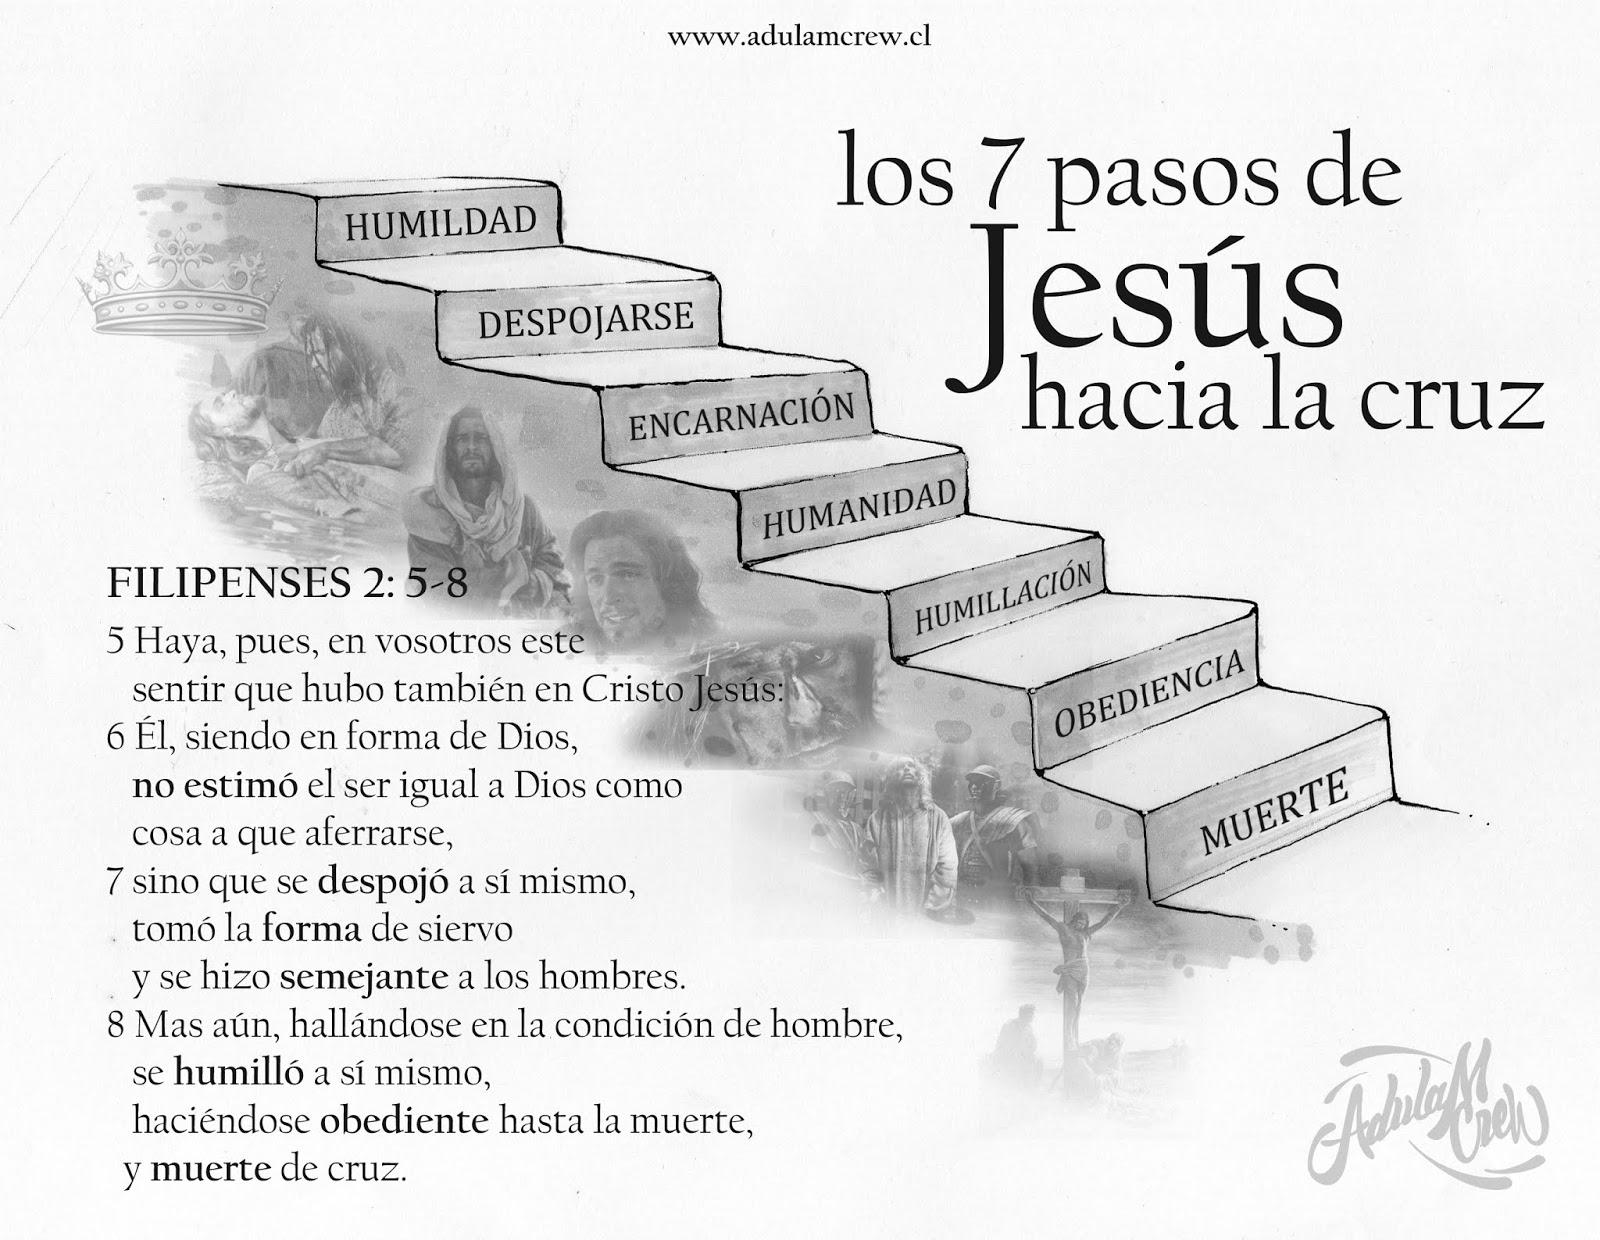 Selma: el poder de un sueño - image 7%2BPASOS on http://adulamcrew.cl